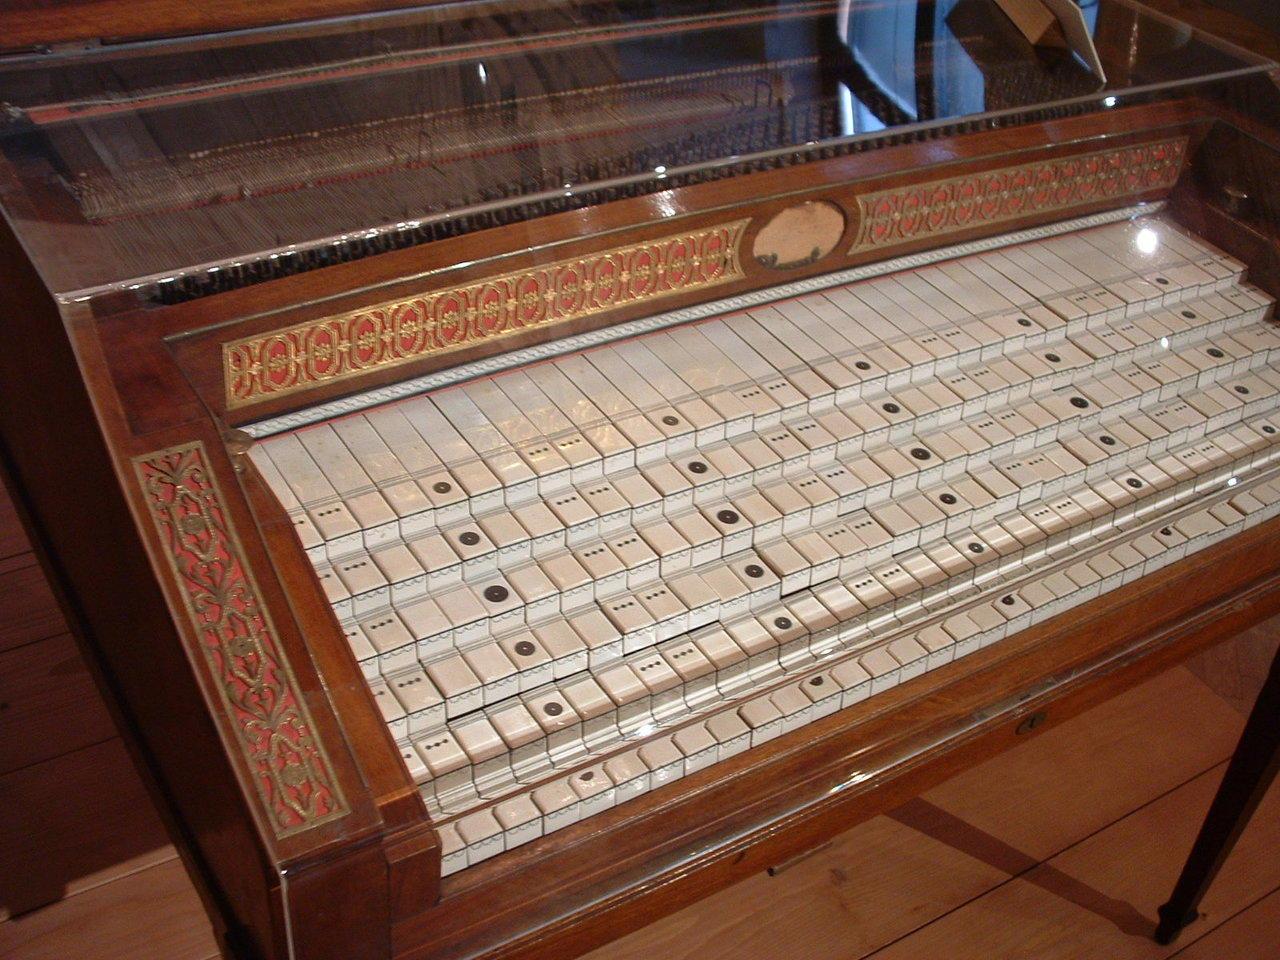 Piano metamorfoseado (Piano microtonal)